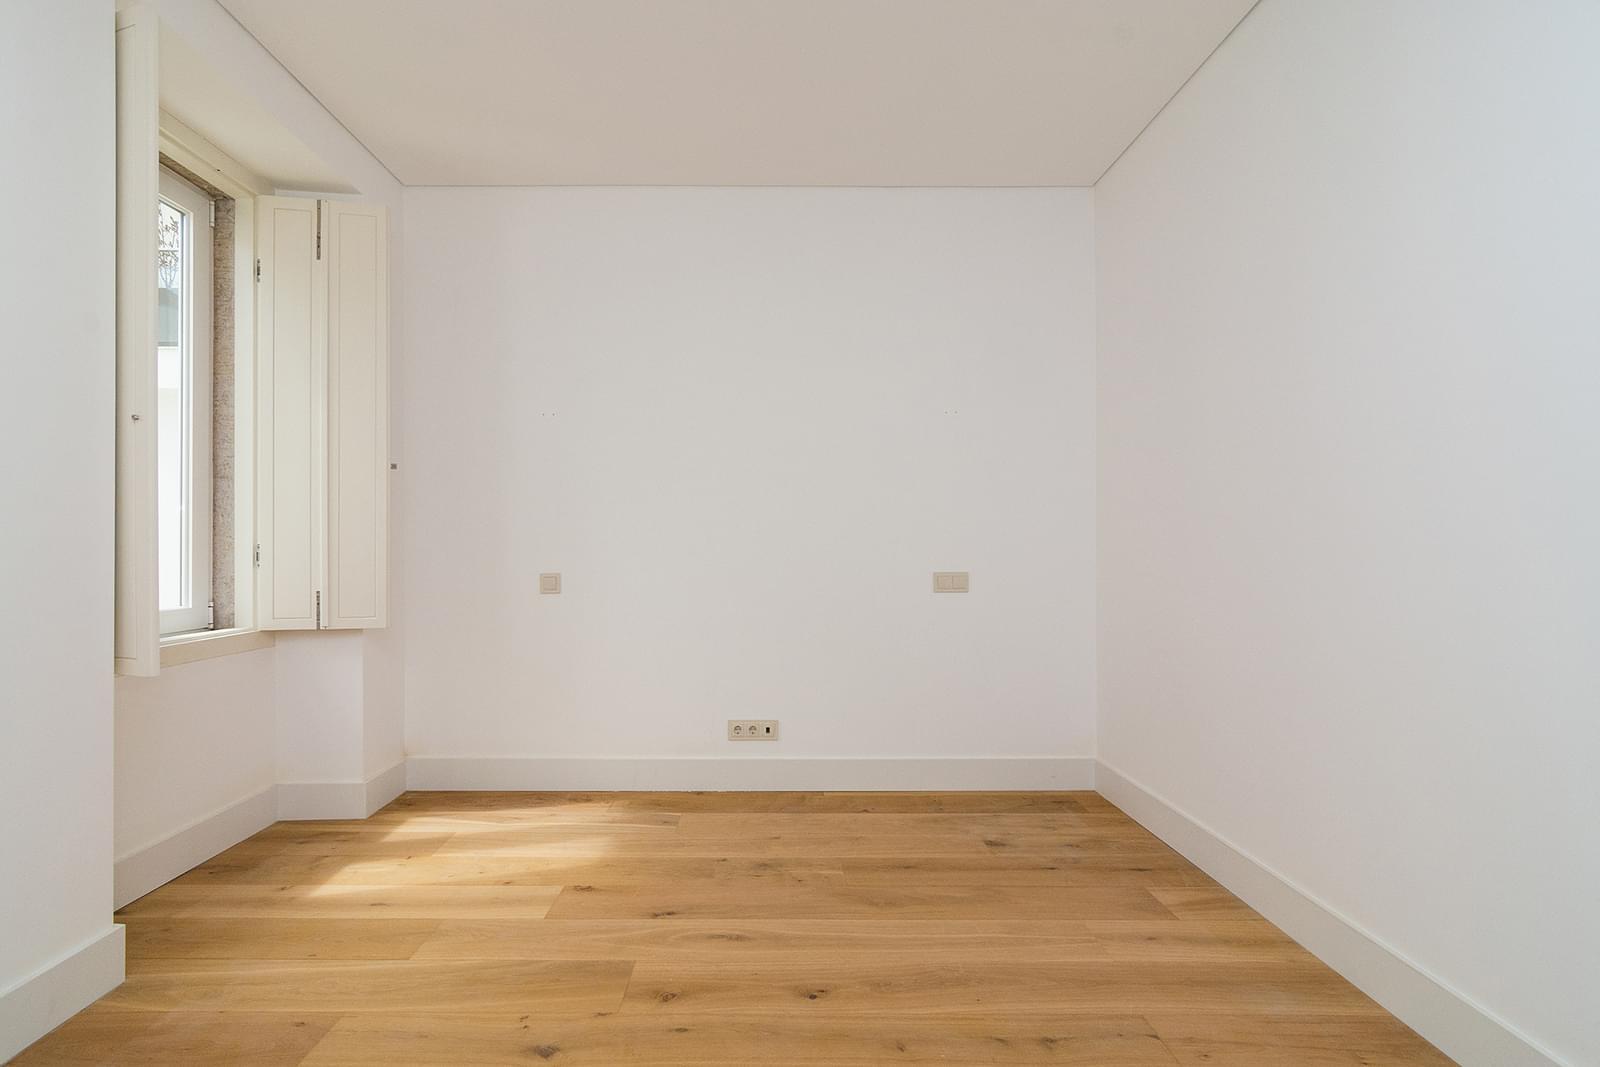 pf16887-apartamento-t5-lisboa-57e4786e-c14f-4b35-88f1-1bc79d656f72